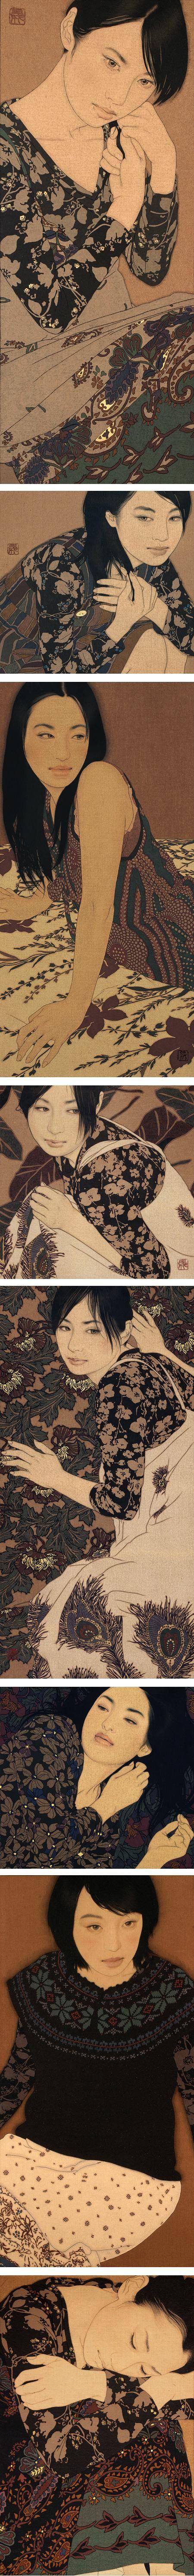 Ikenaga Yasunari, portraits of women in soot ink, mineral pigments, Menso brush http://ikenaga-yasunari.com/